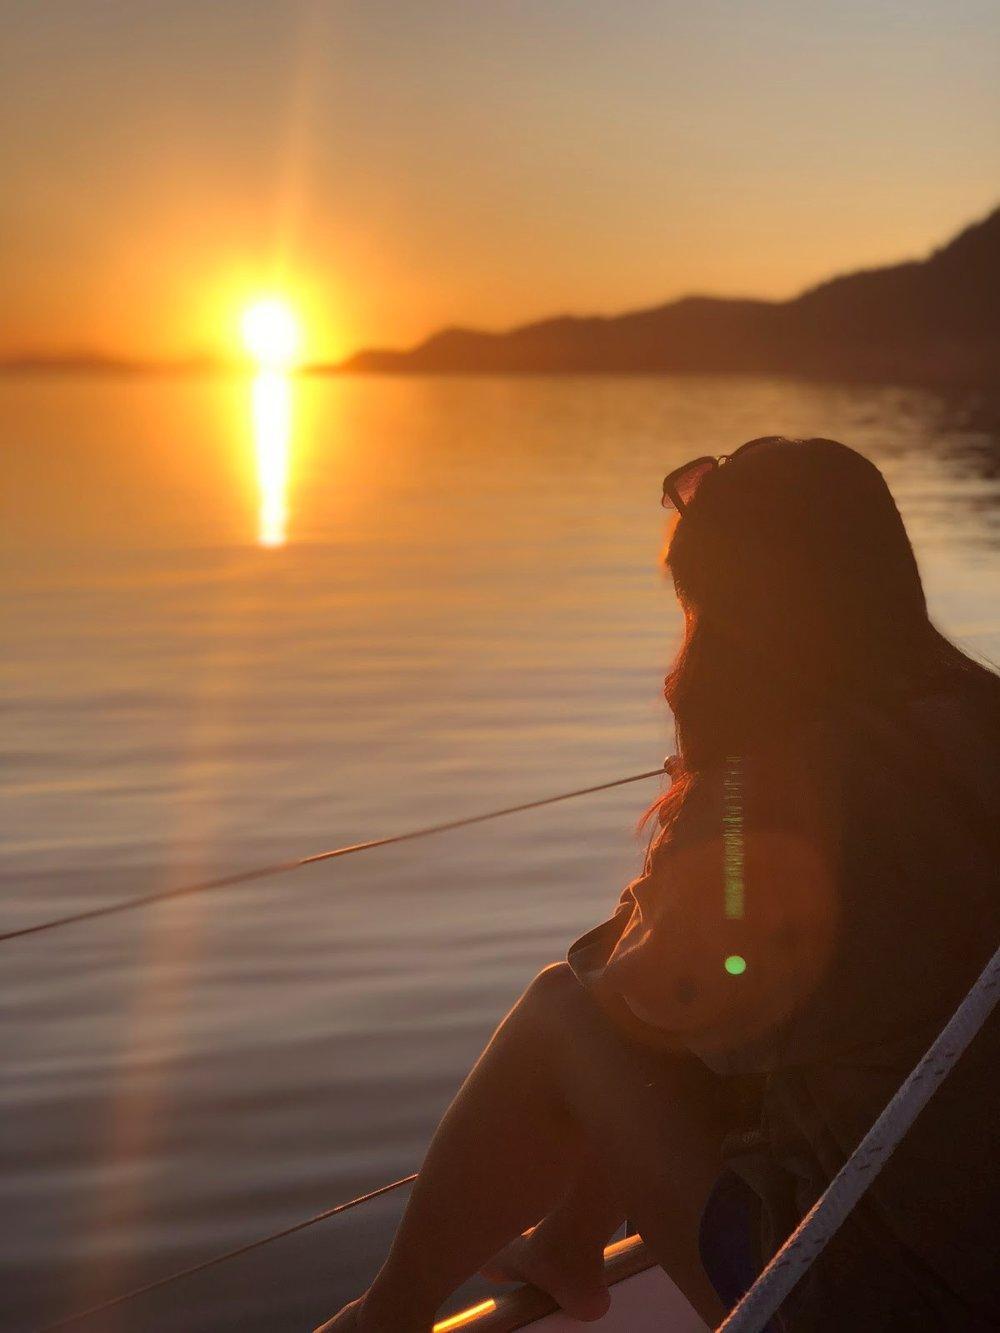 Michaela watching the sunset